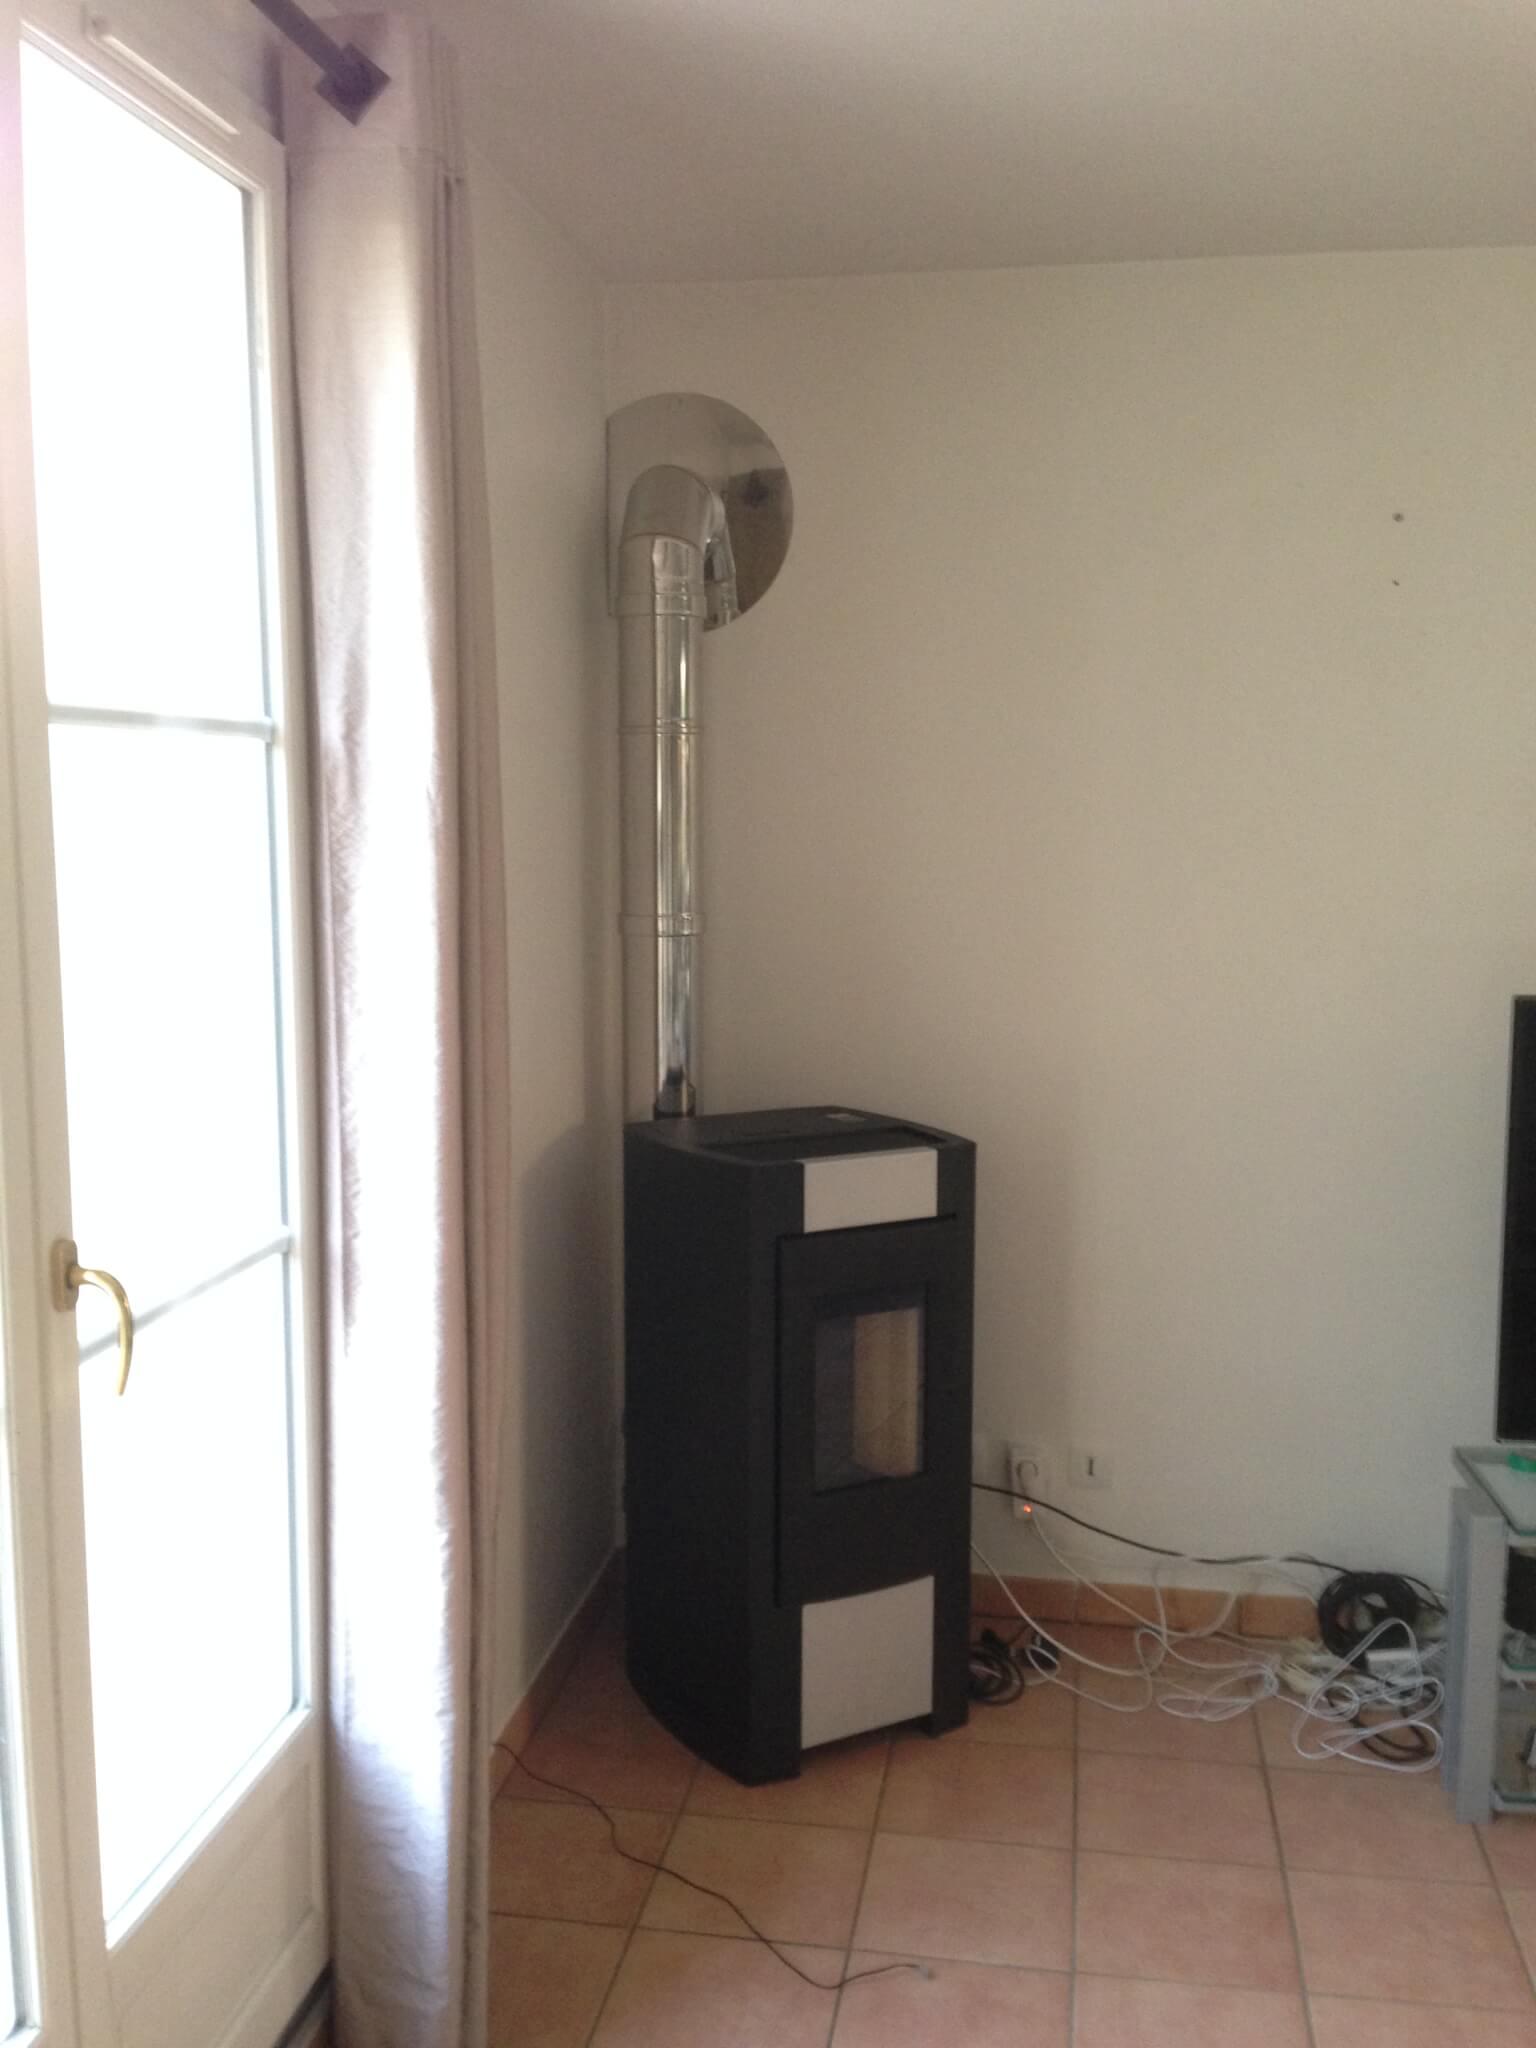 conduit en sortie murale stera. Black Bedroom Furniture Sets. Home Design Ideas